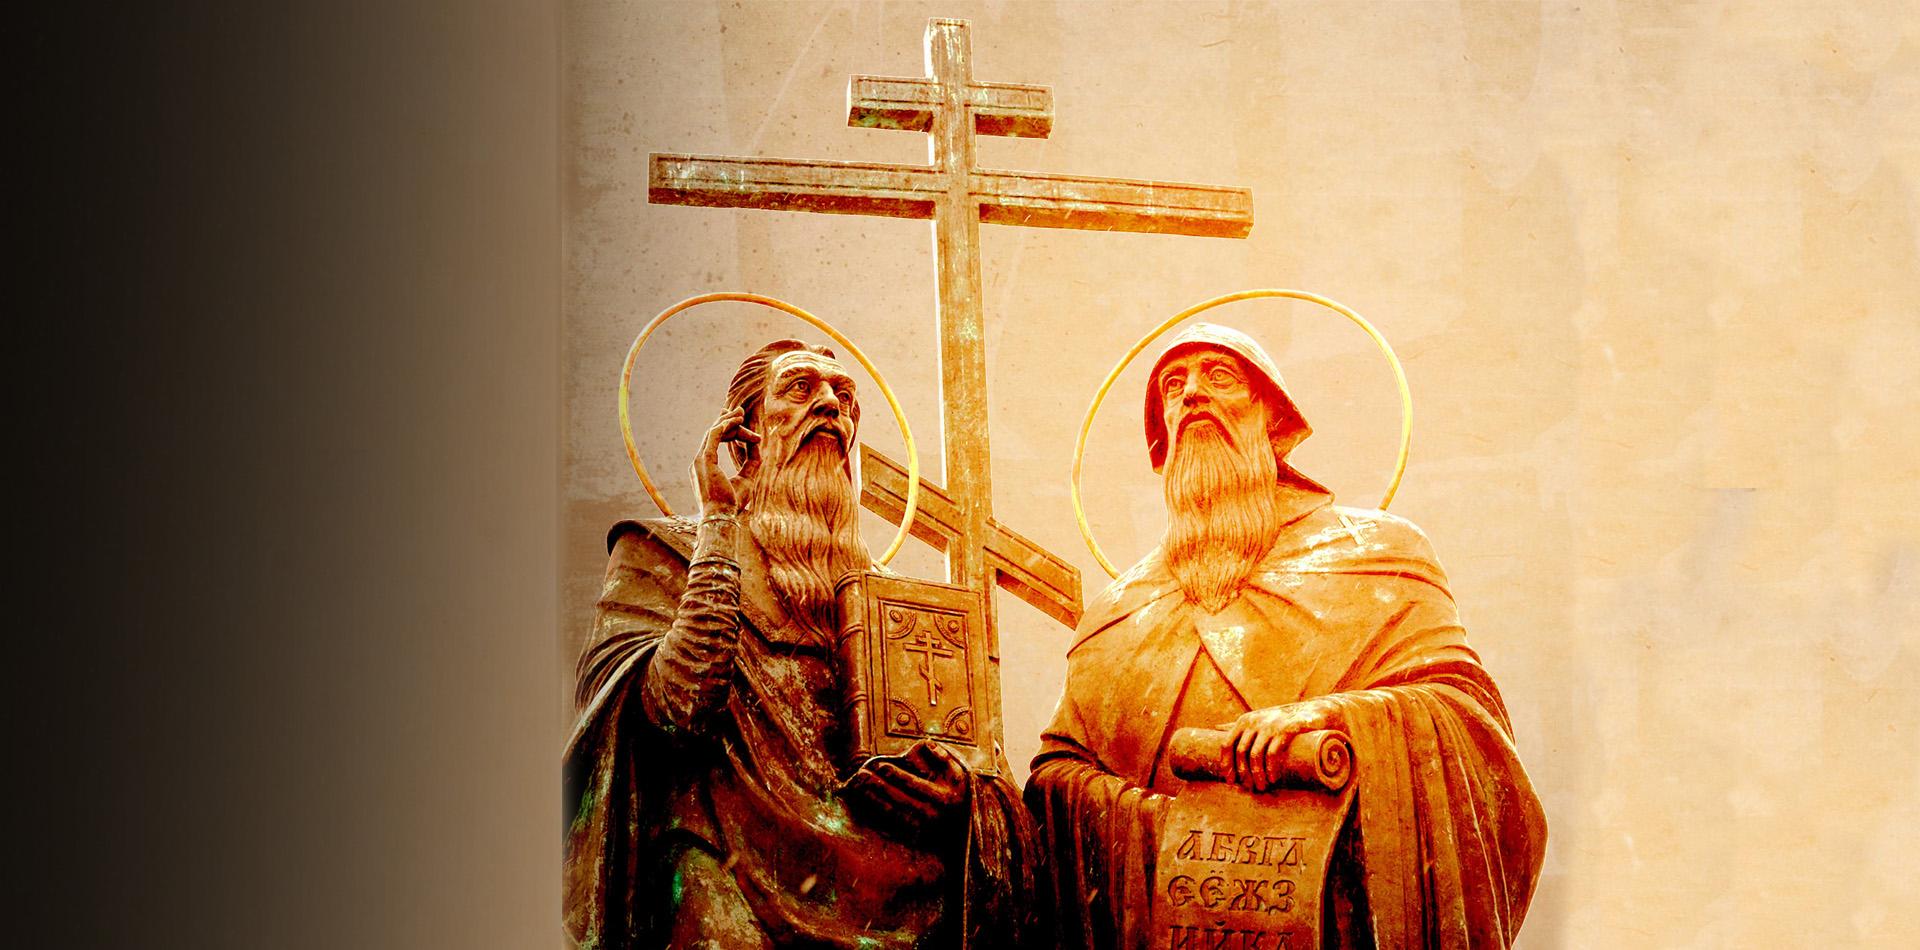 The saints Cyril and Methodius